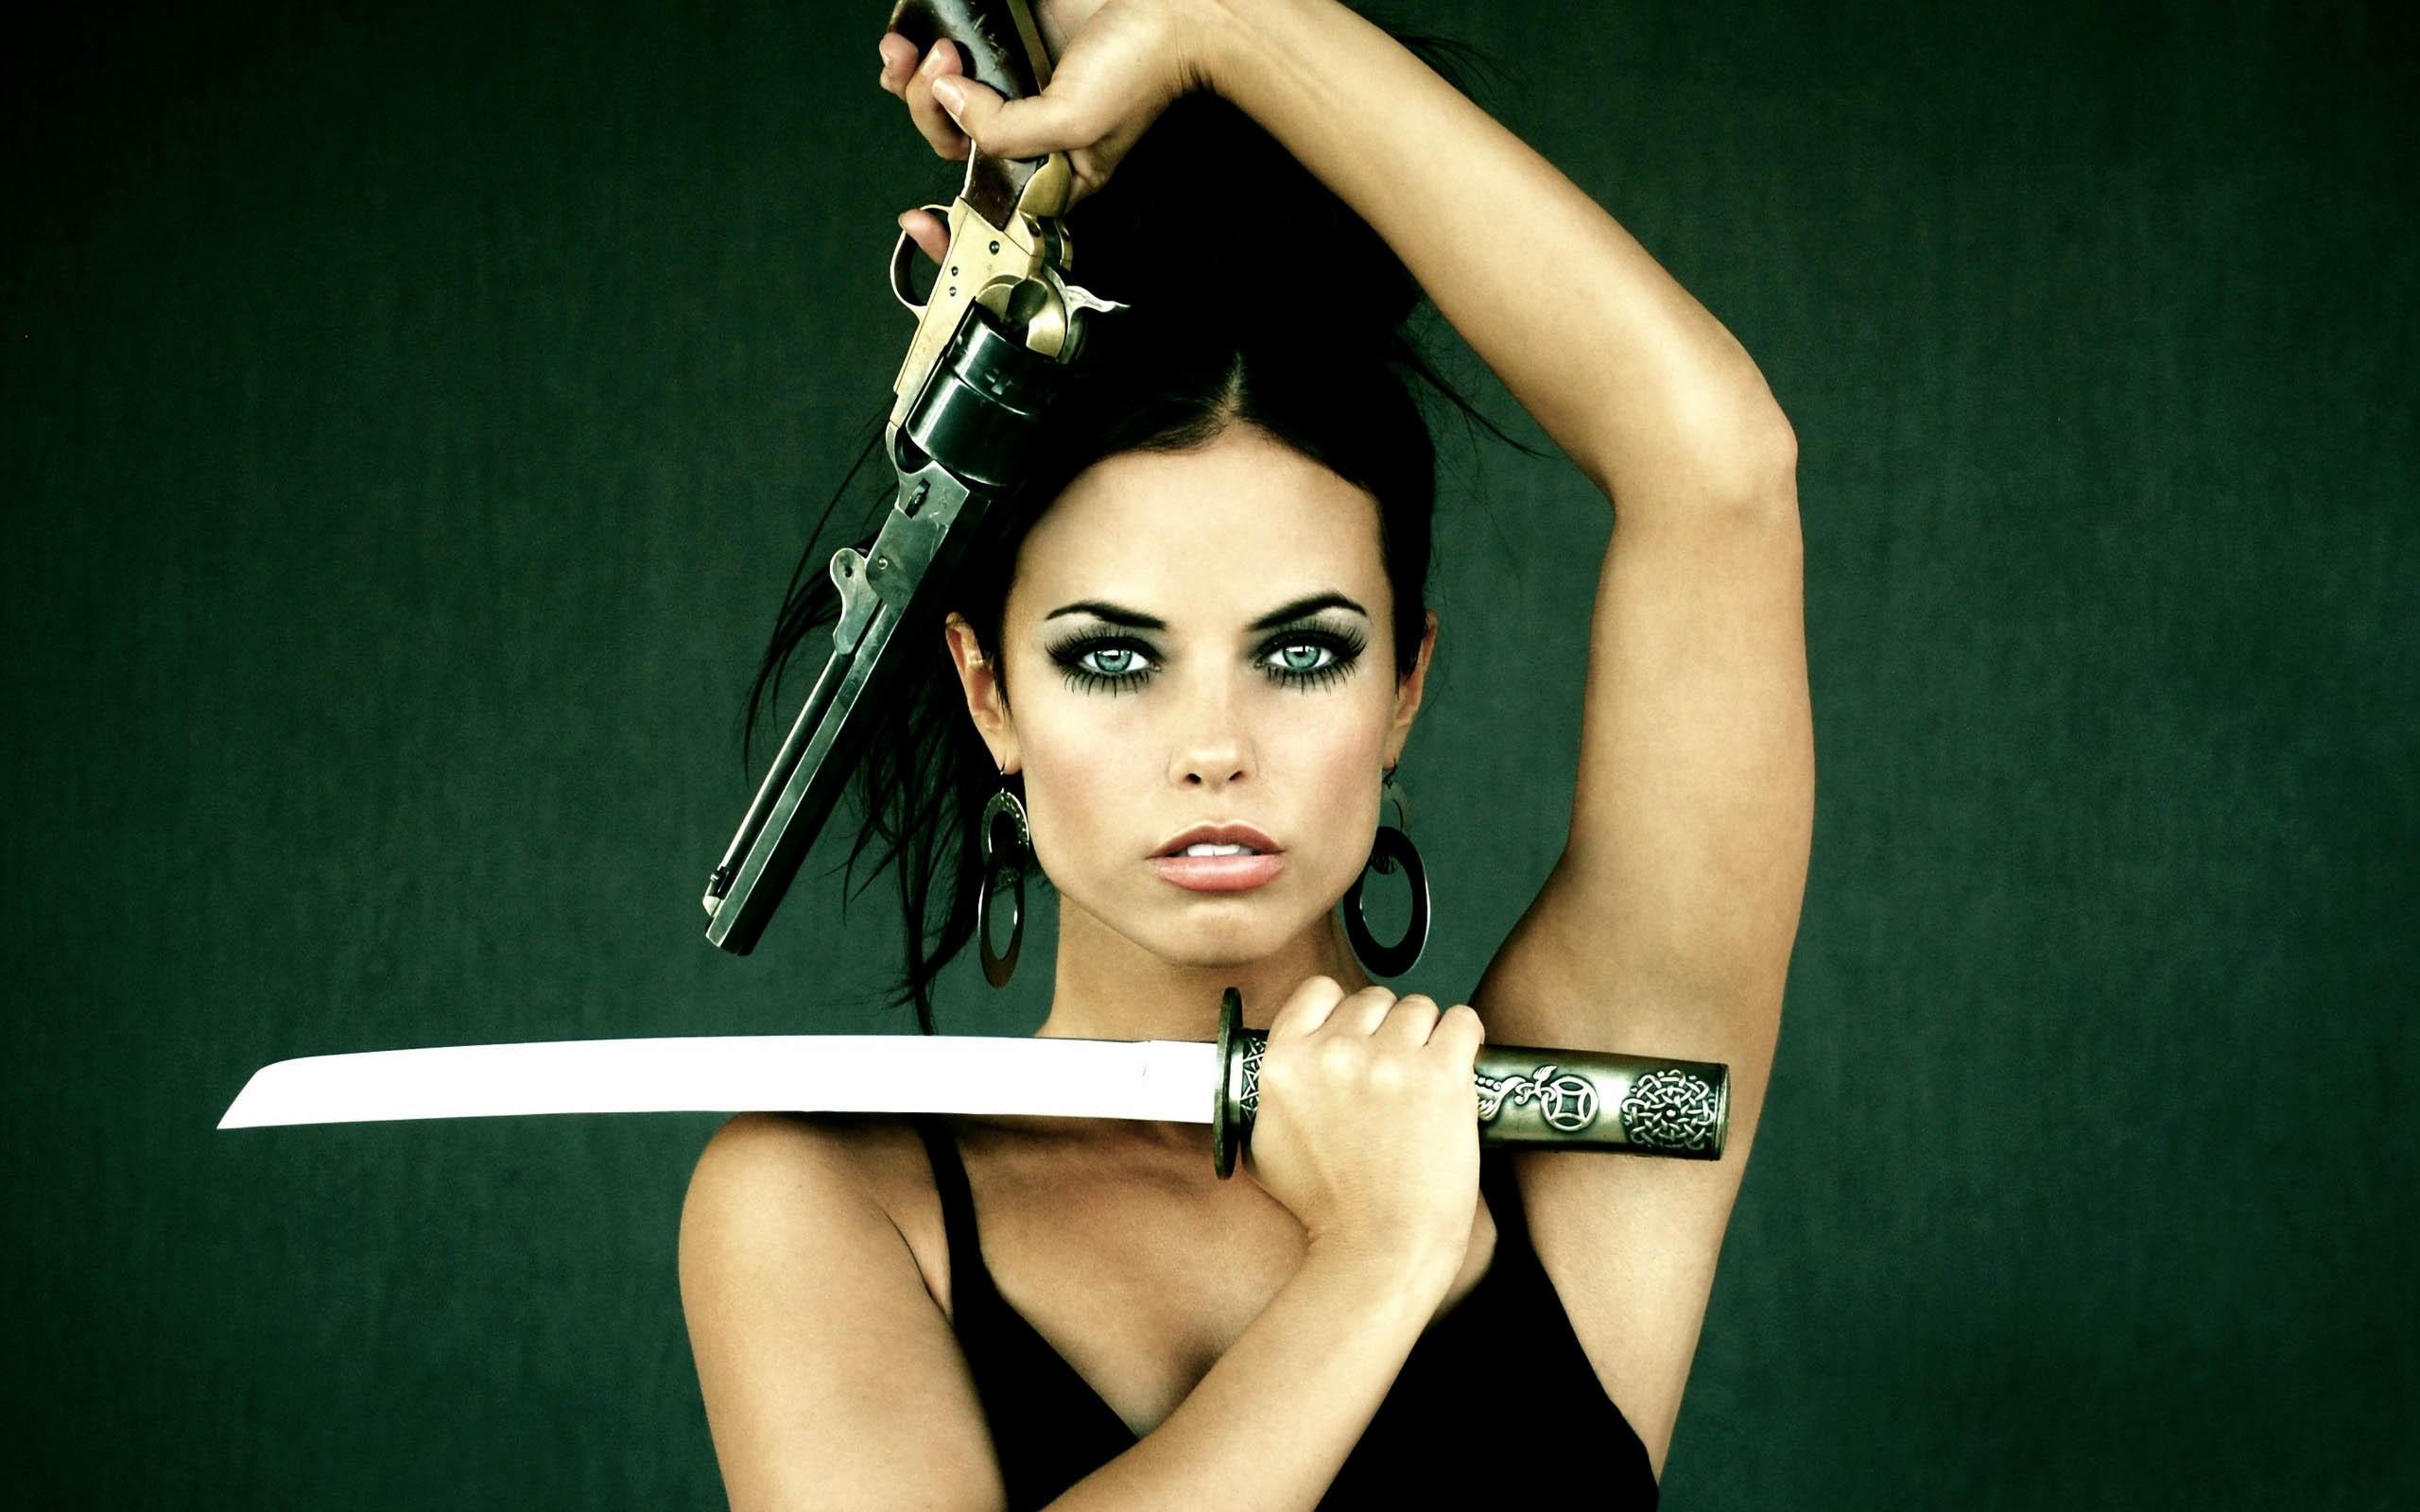 женщина-убийца мужчин - виша-канья